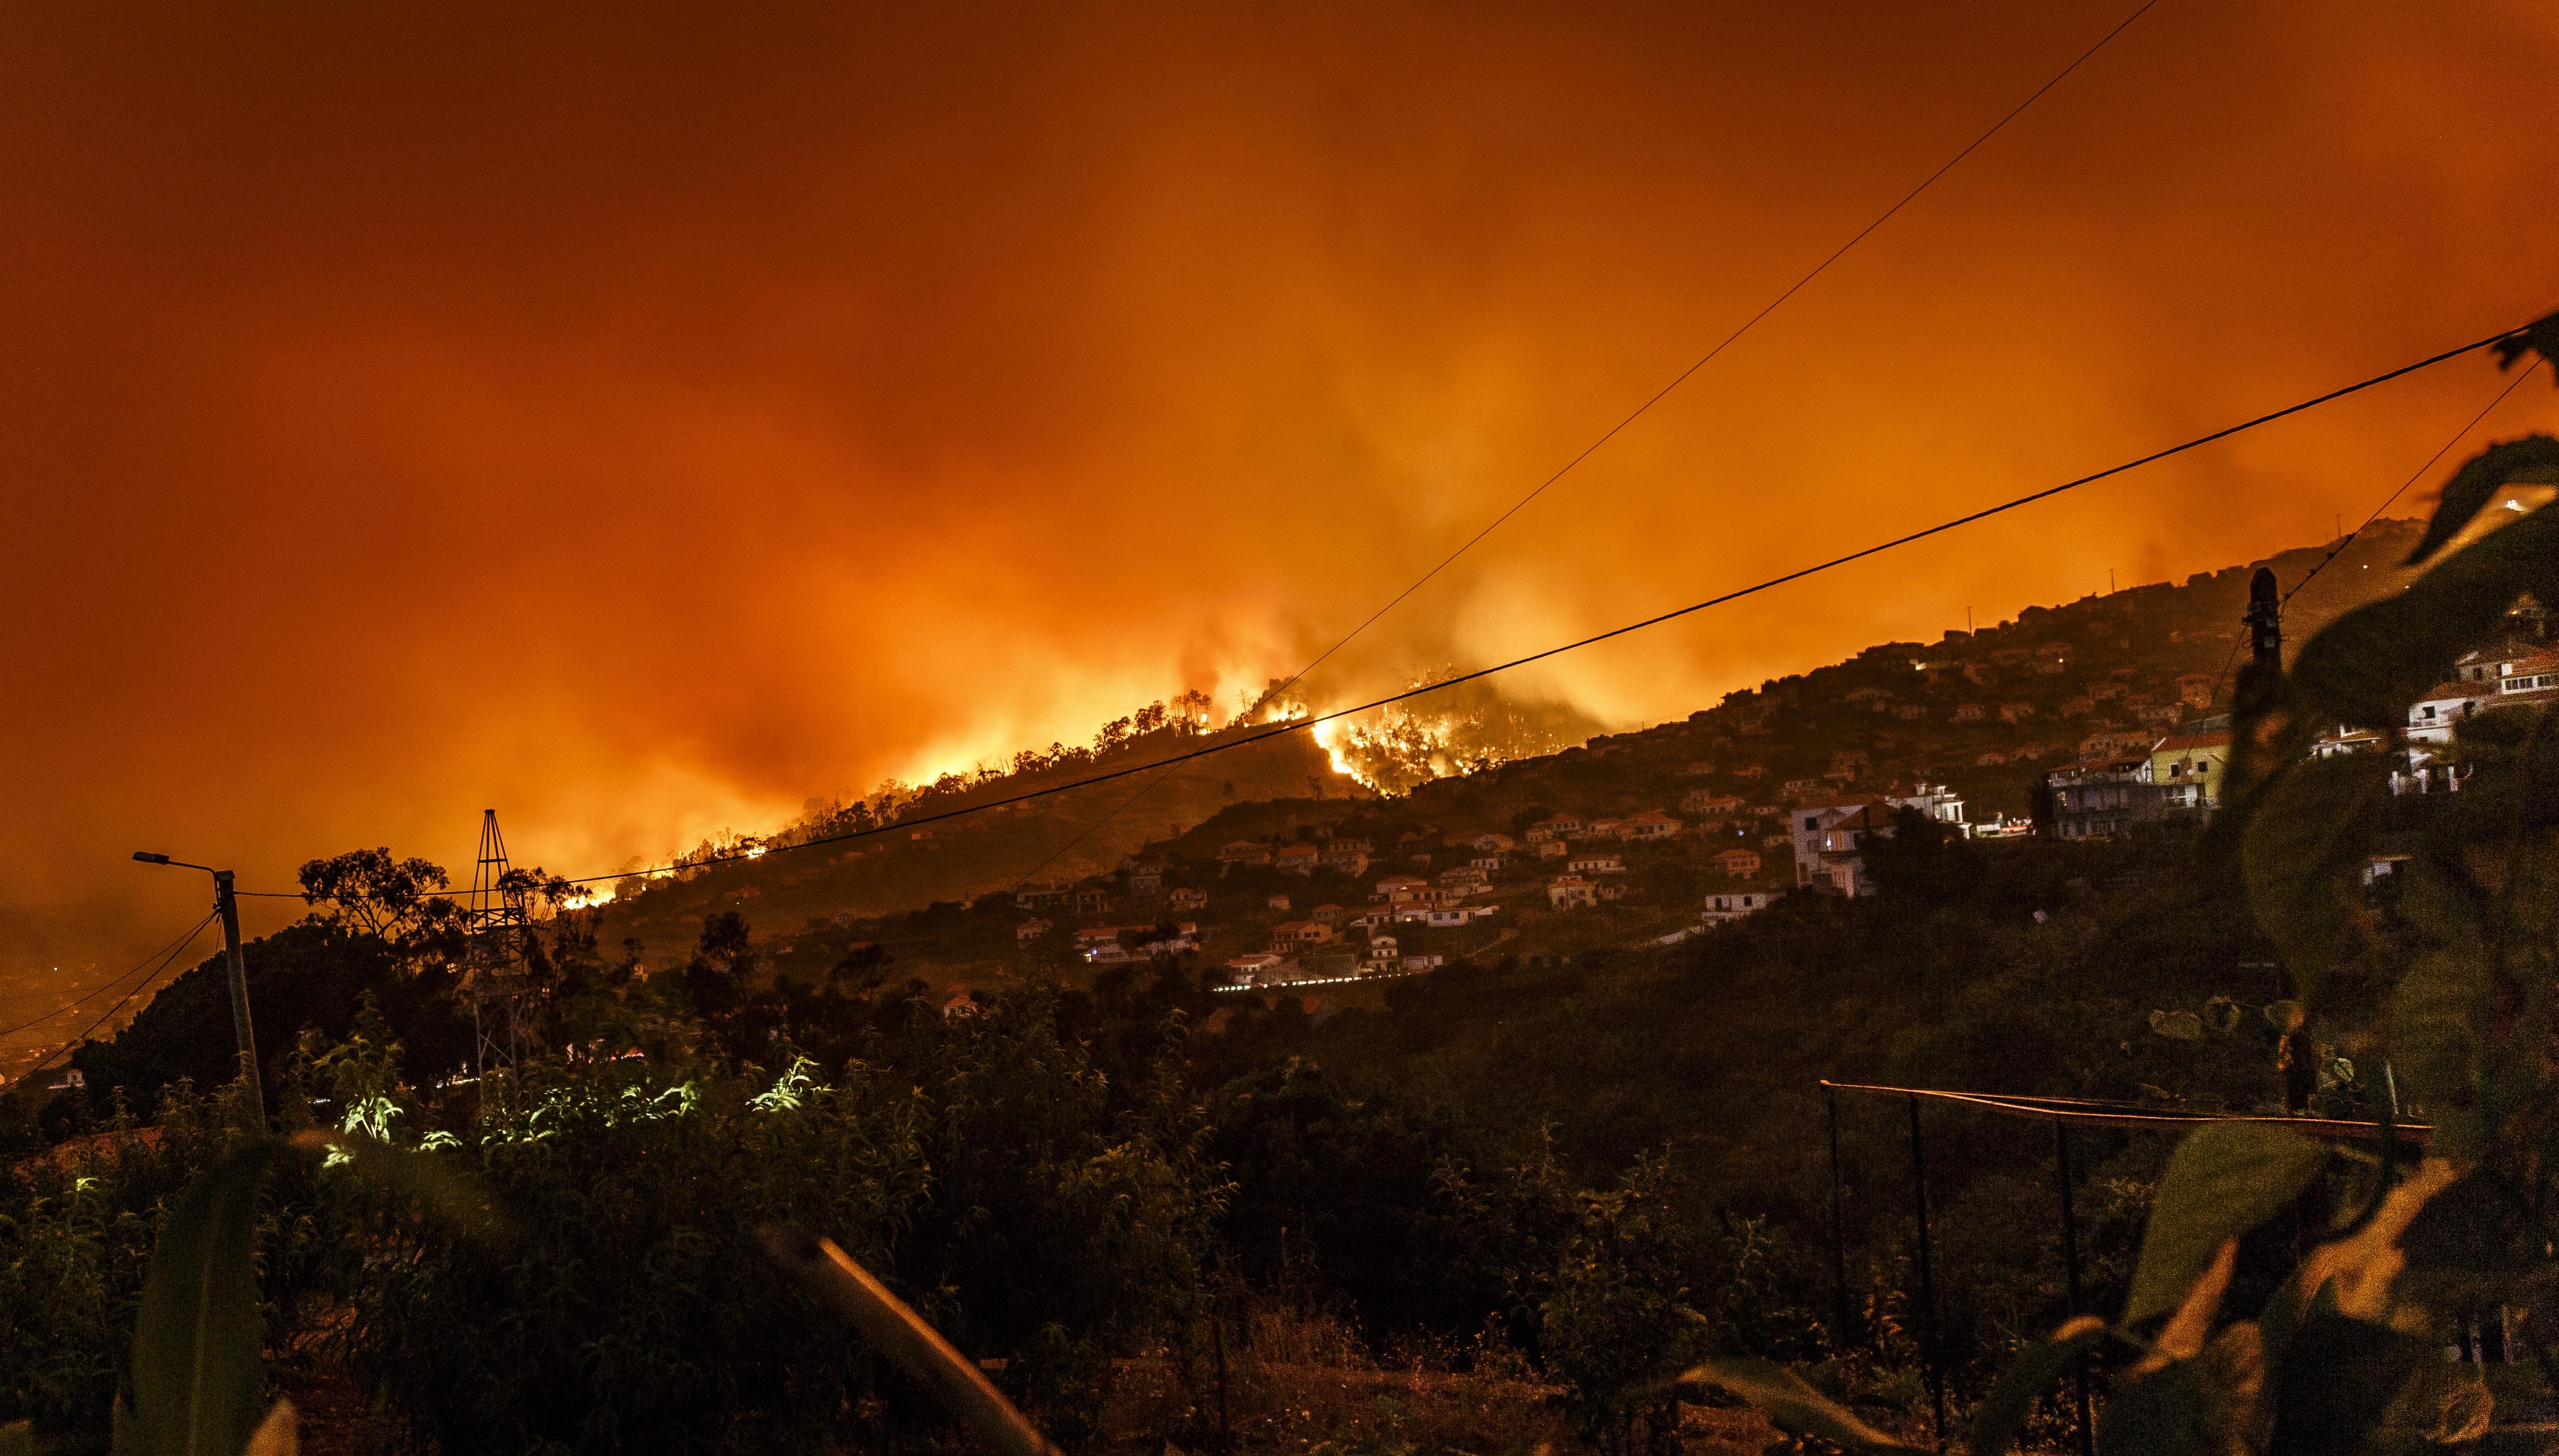 Forest fire creates an orange silhouette around a hill in Estreito da Calheta during evening